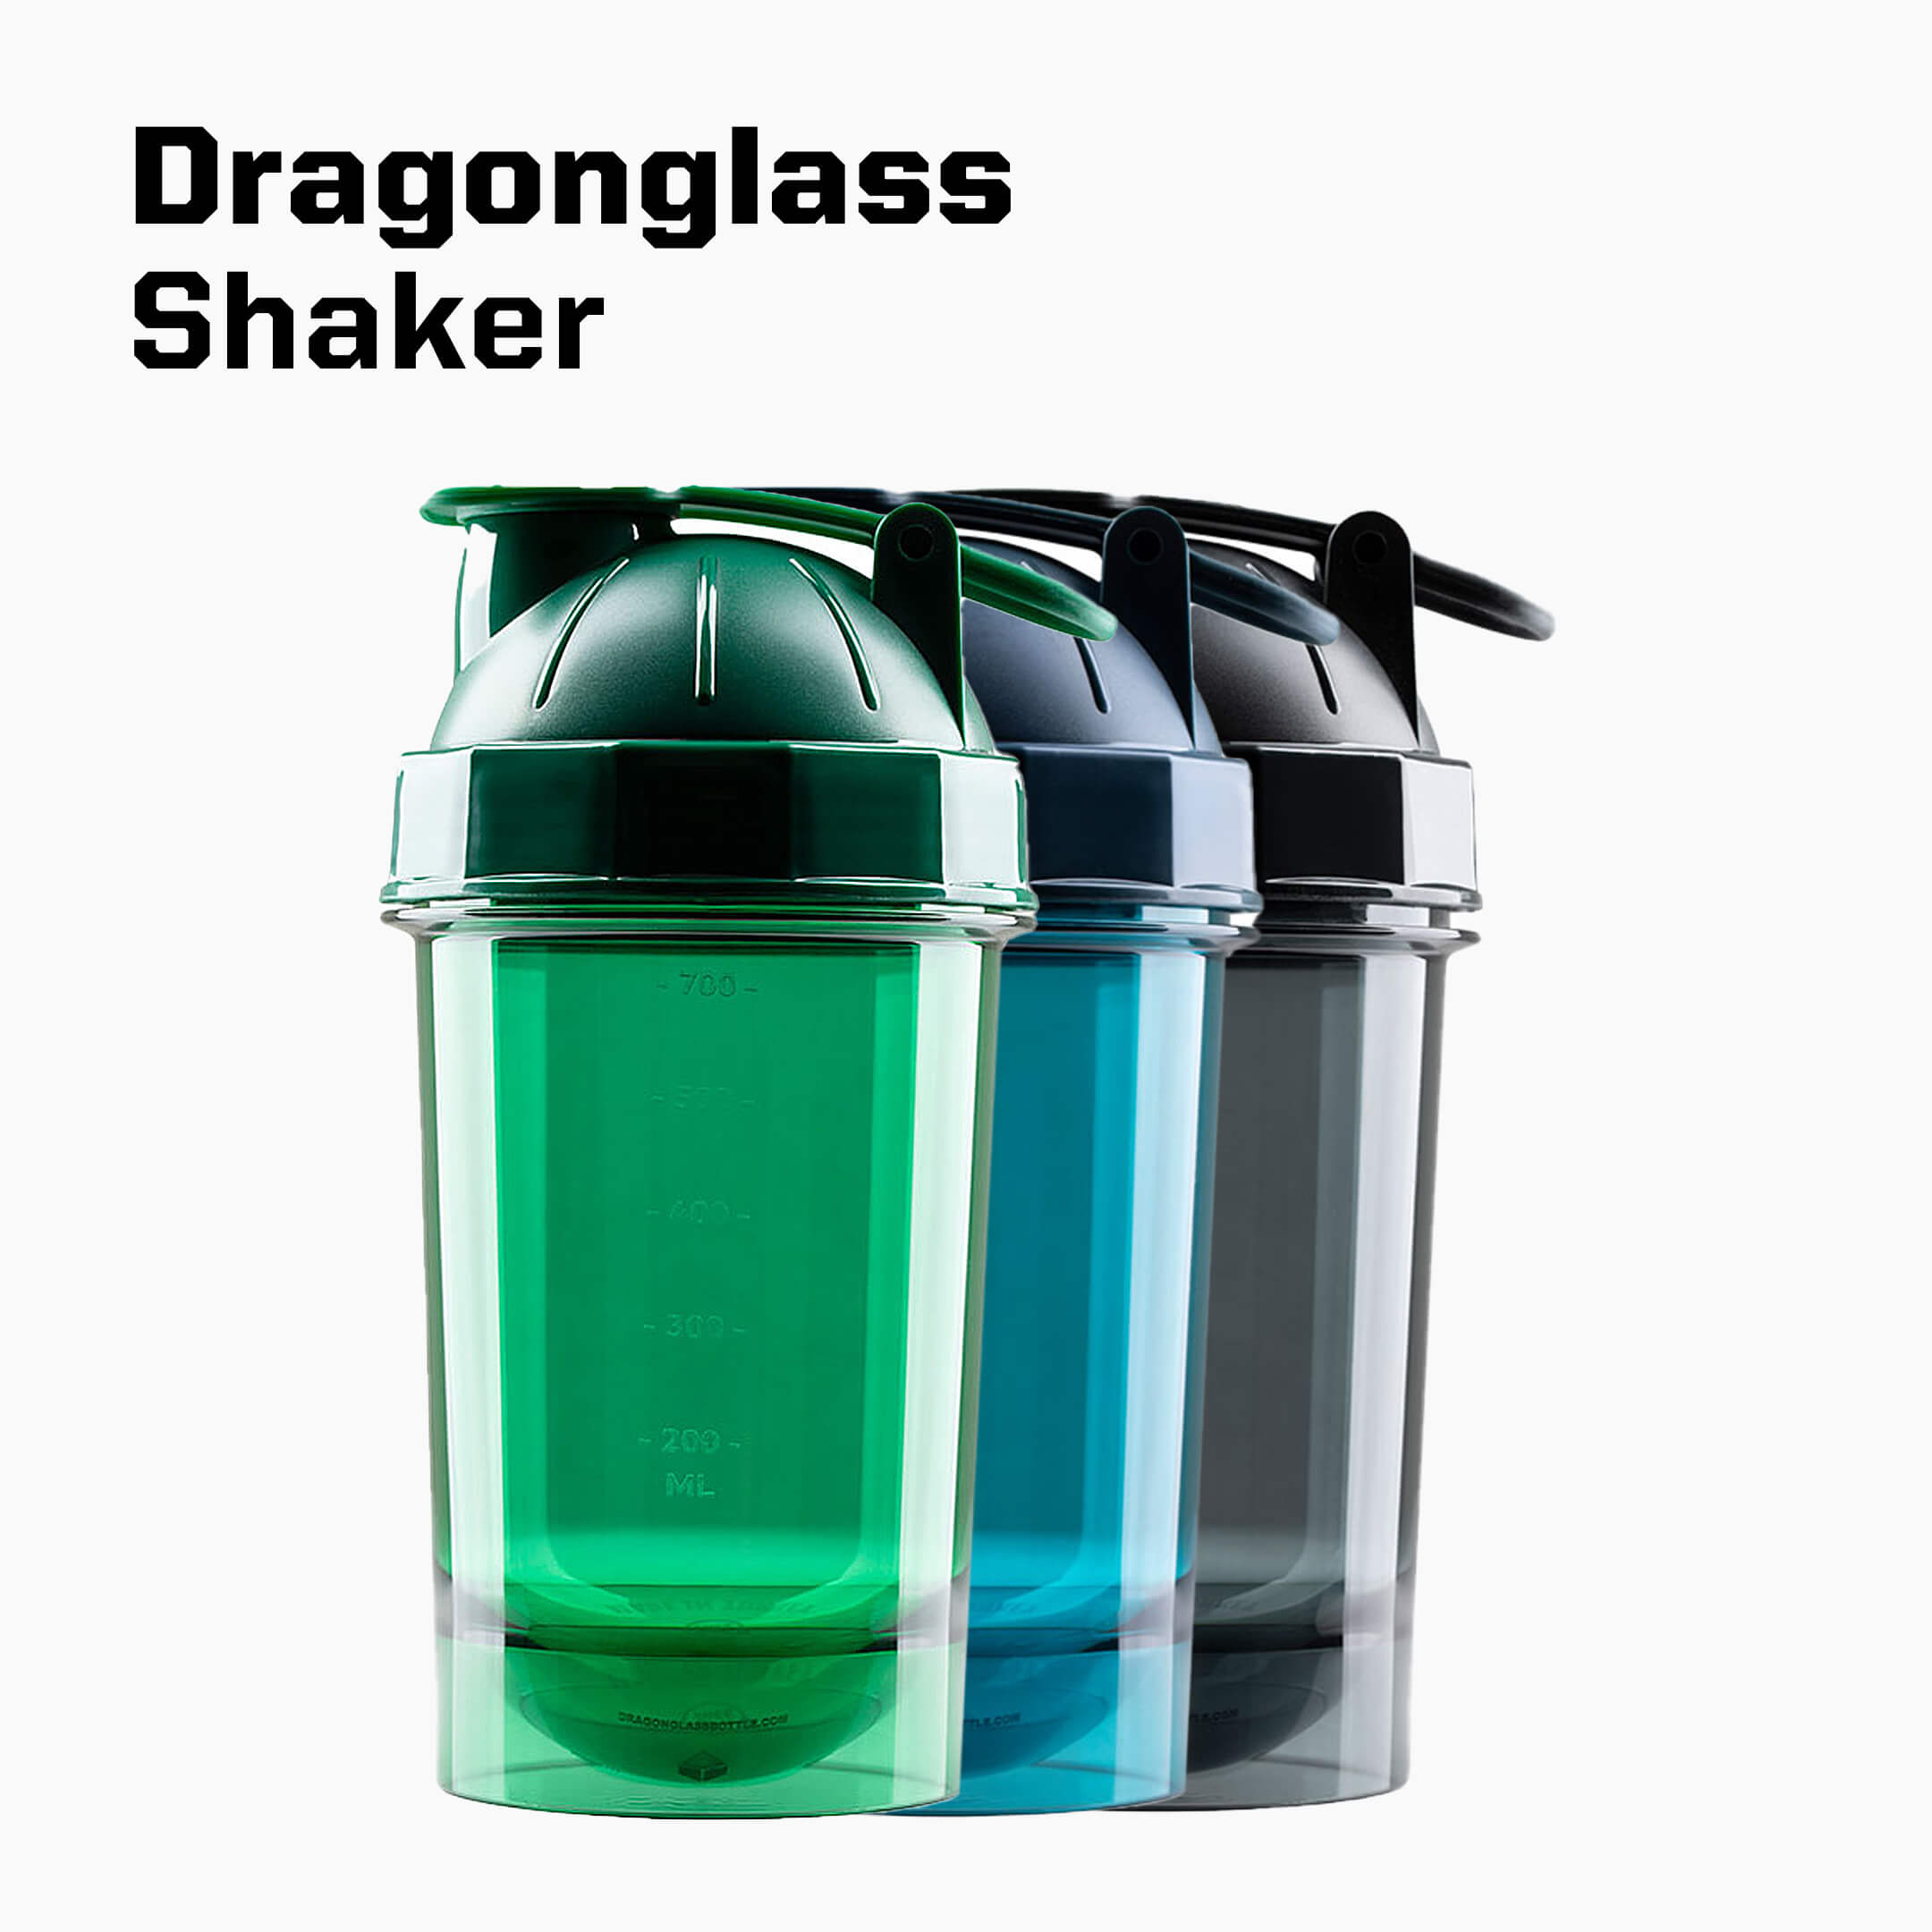 Dragonglass shaker tritan